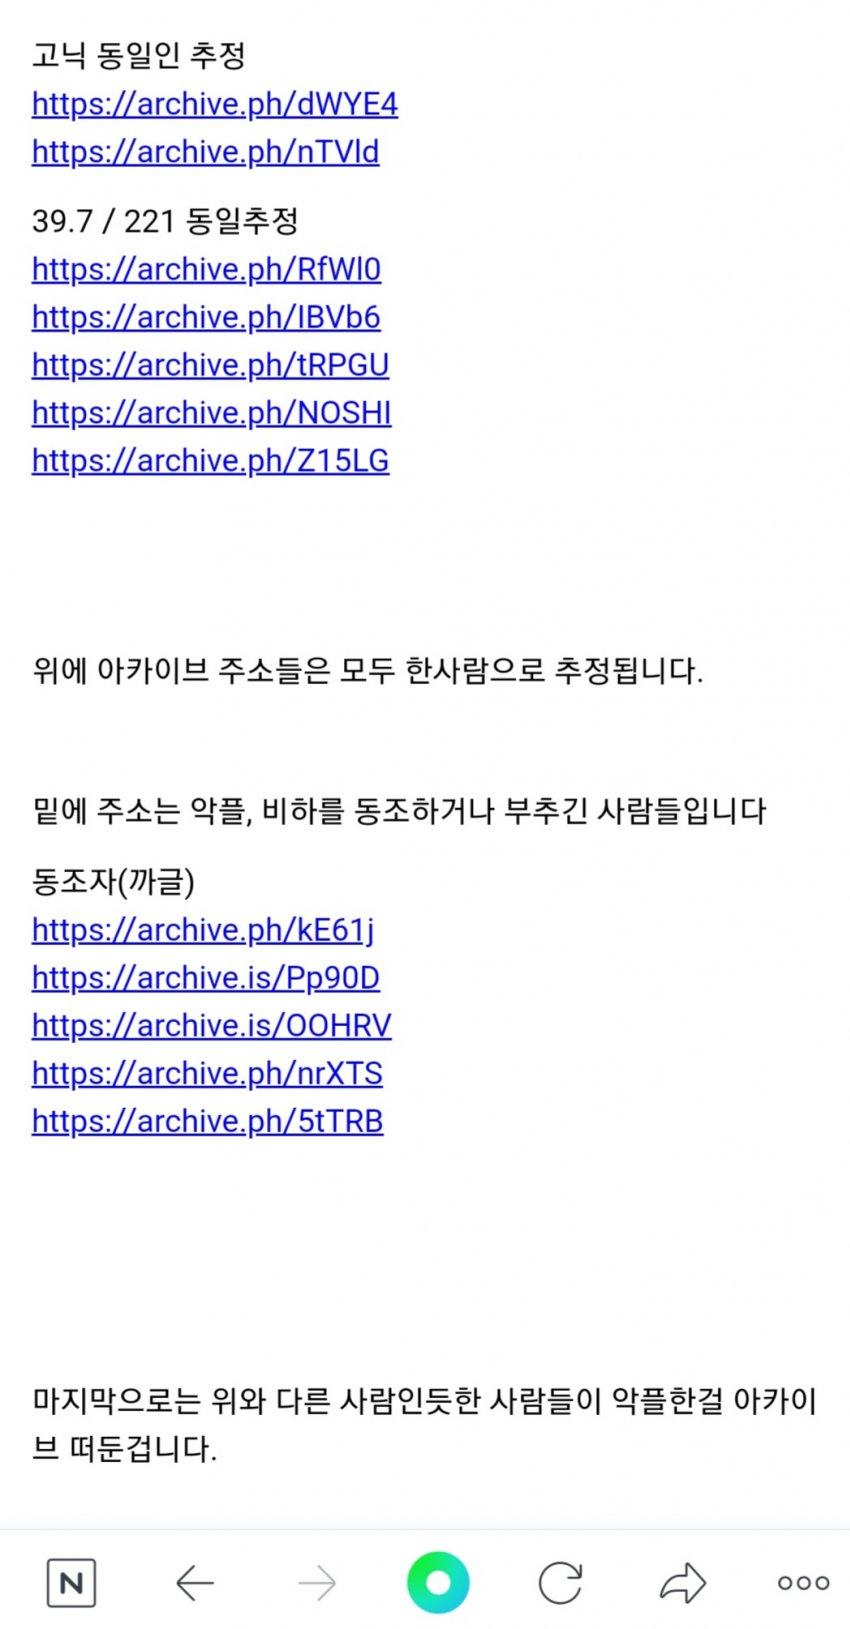 viewimage.php?id=3db8de32eddd2db56b&no=24b0d769e1d32ca73dec81fa11d028314d3faebecfec25ed6aa778bc795ff30aaaef2764e7317f3ba36c583a67815a6c5dc256622af7c386817c07545a323fcd994fd82a3ea6fe699be739b6325e25bf62b11b28